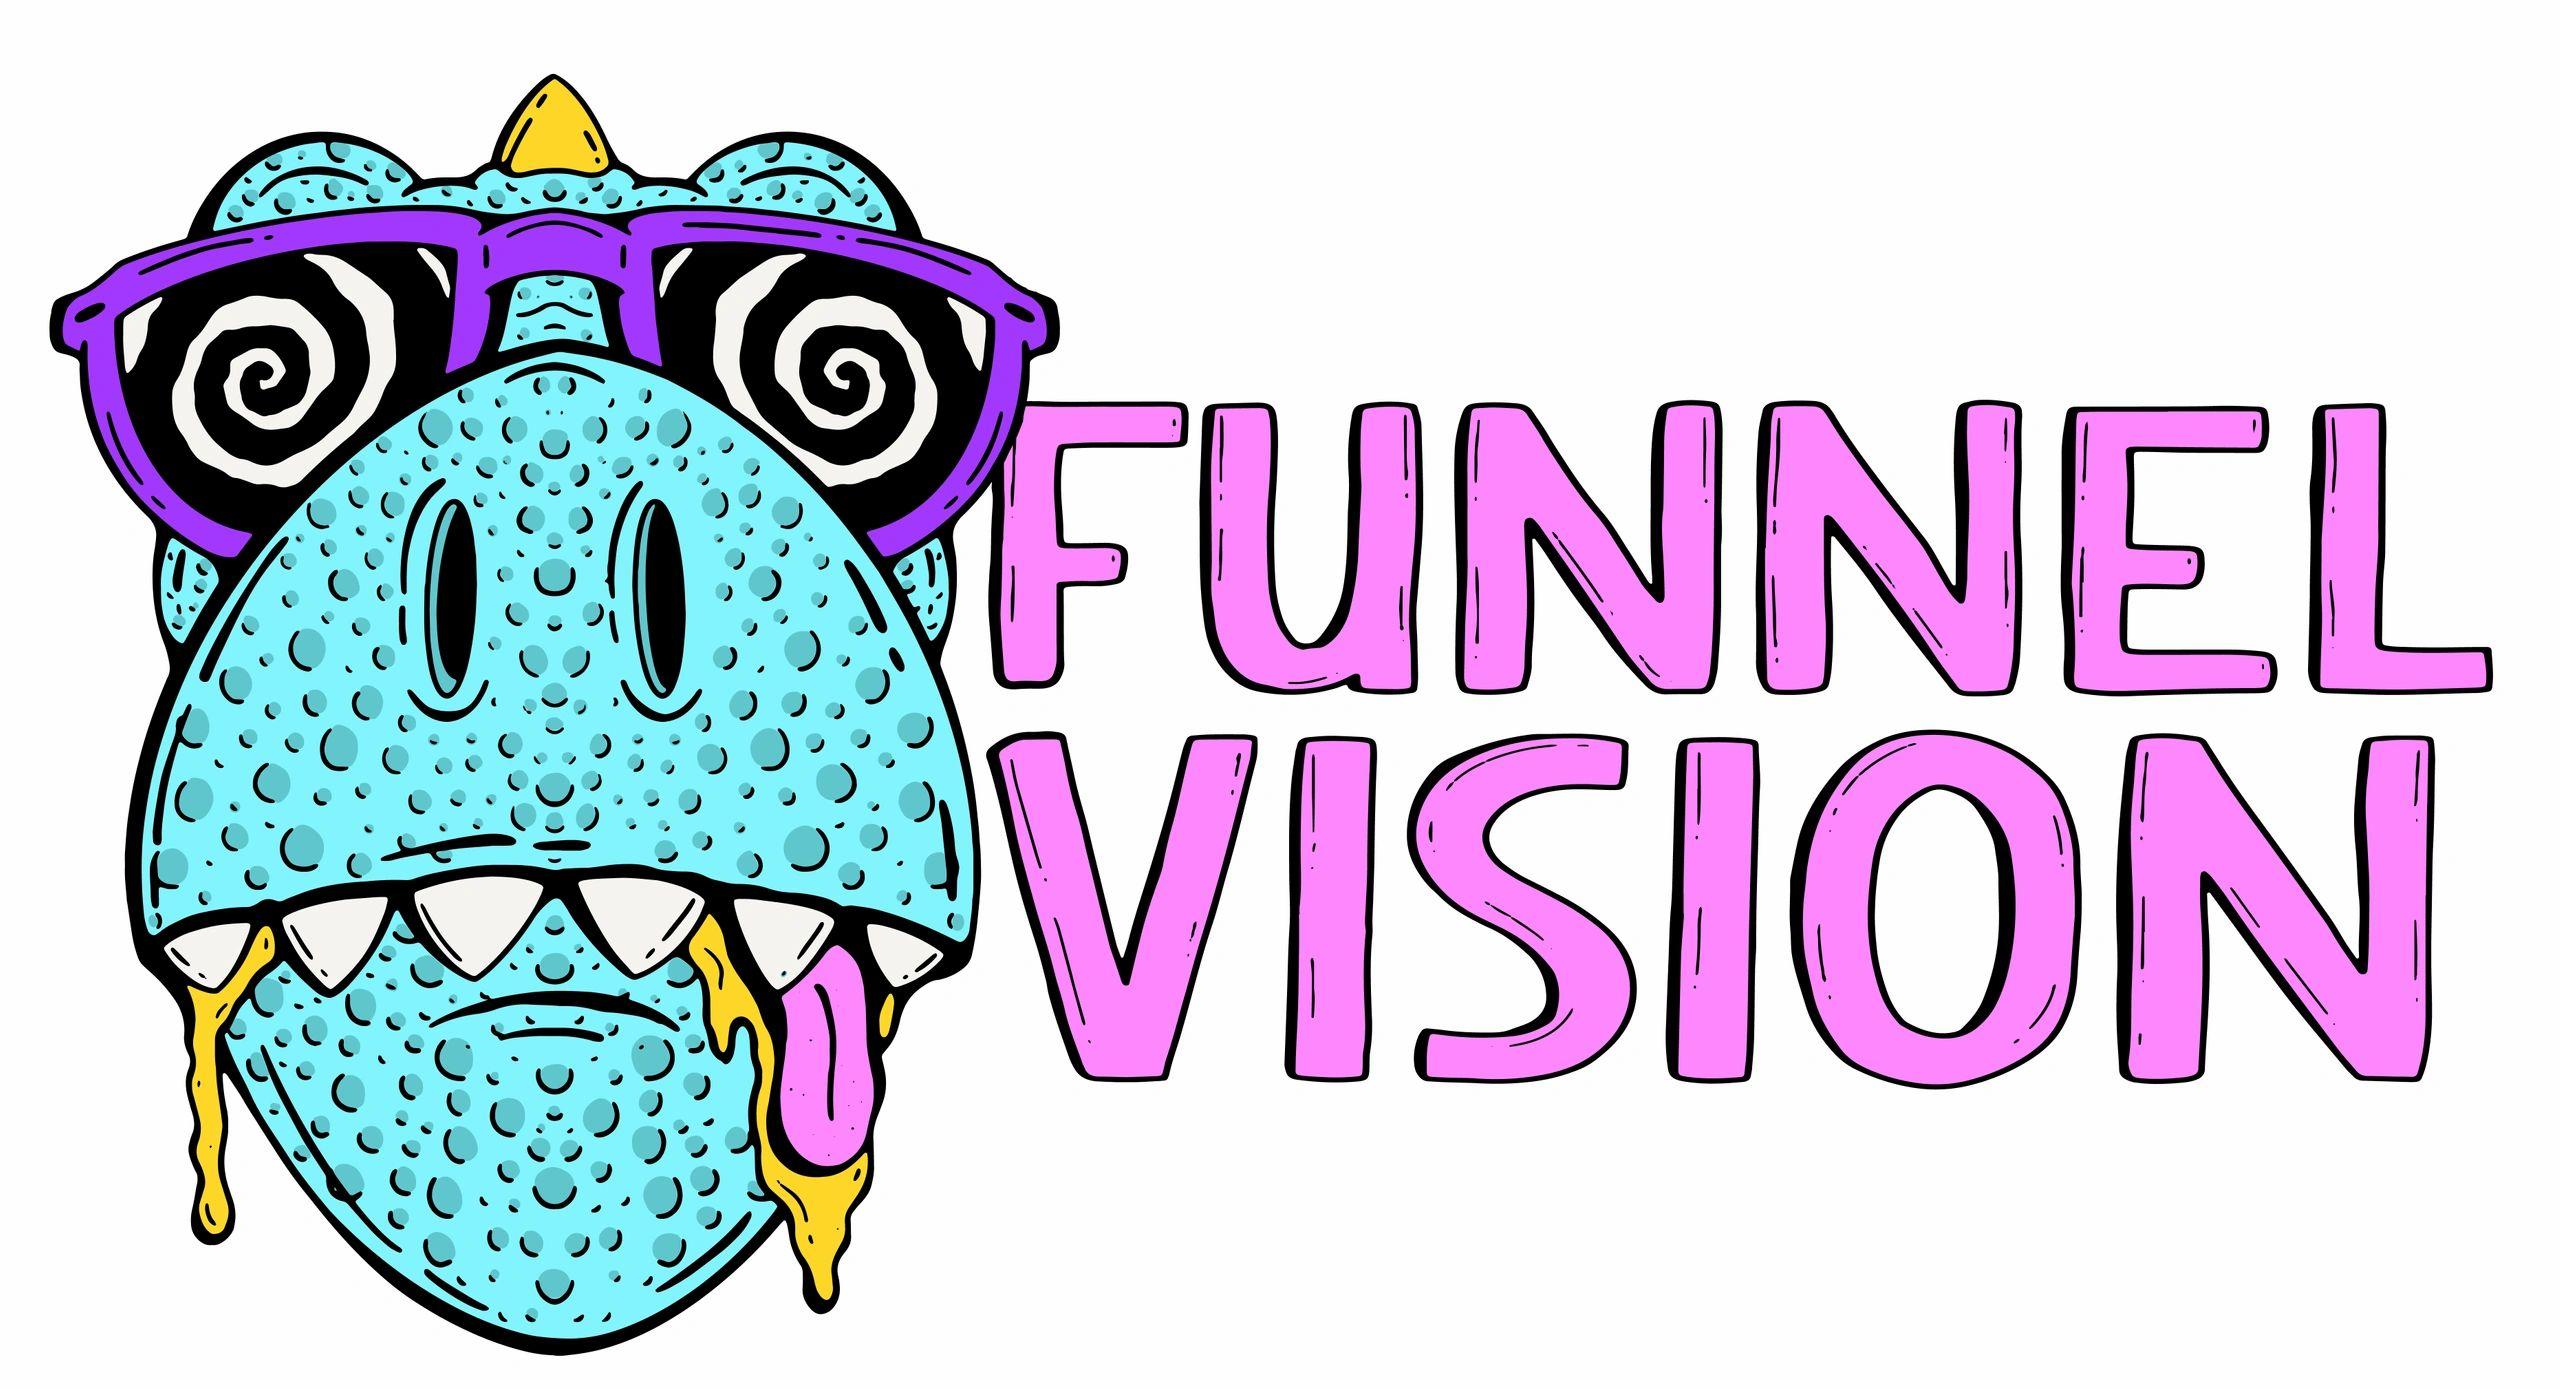 Funnel Vision Intro Effects Round 1 vs Rj Kumar, Megan ... |Funnel Vision Logo